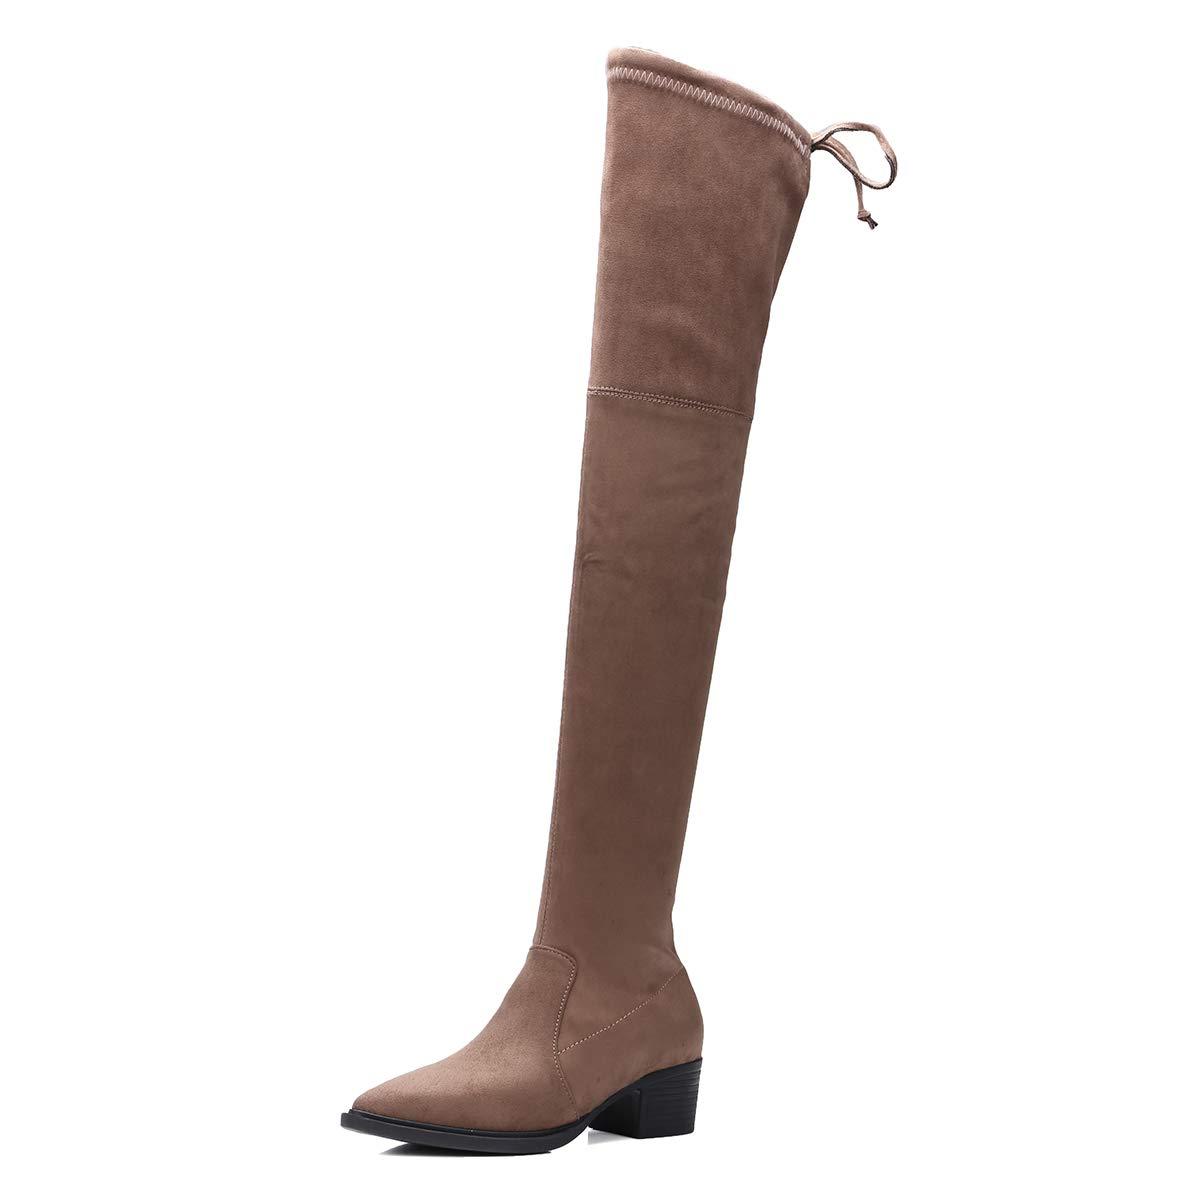 A 39 1 3 EU JQfashion Heels Damen Overknee Winterstiefel aus Velourslederimitat, Oberschenkelhohe Stiefel f&uu ;r Damen